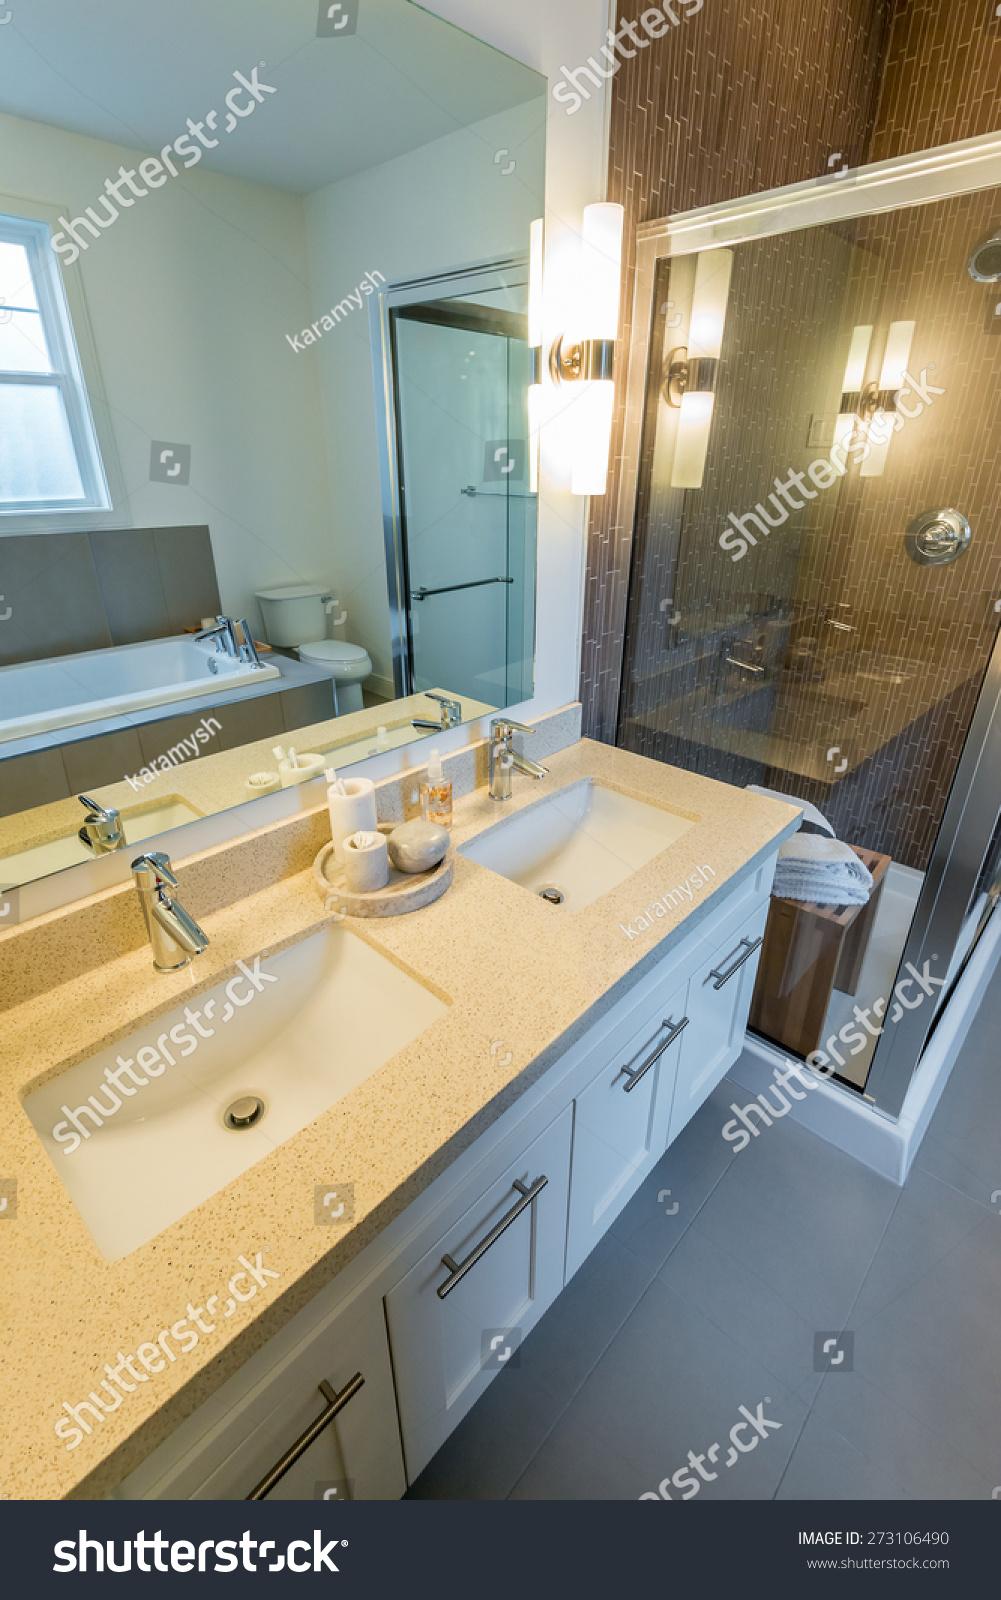 Fragment of a luxury bathroom | EZ Canvas